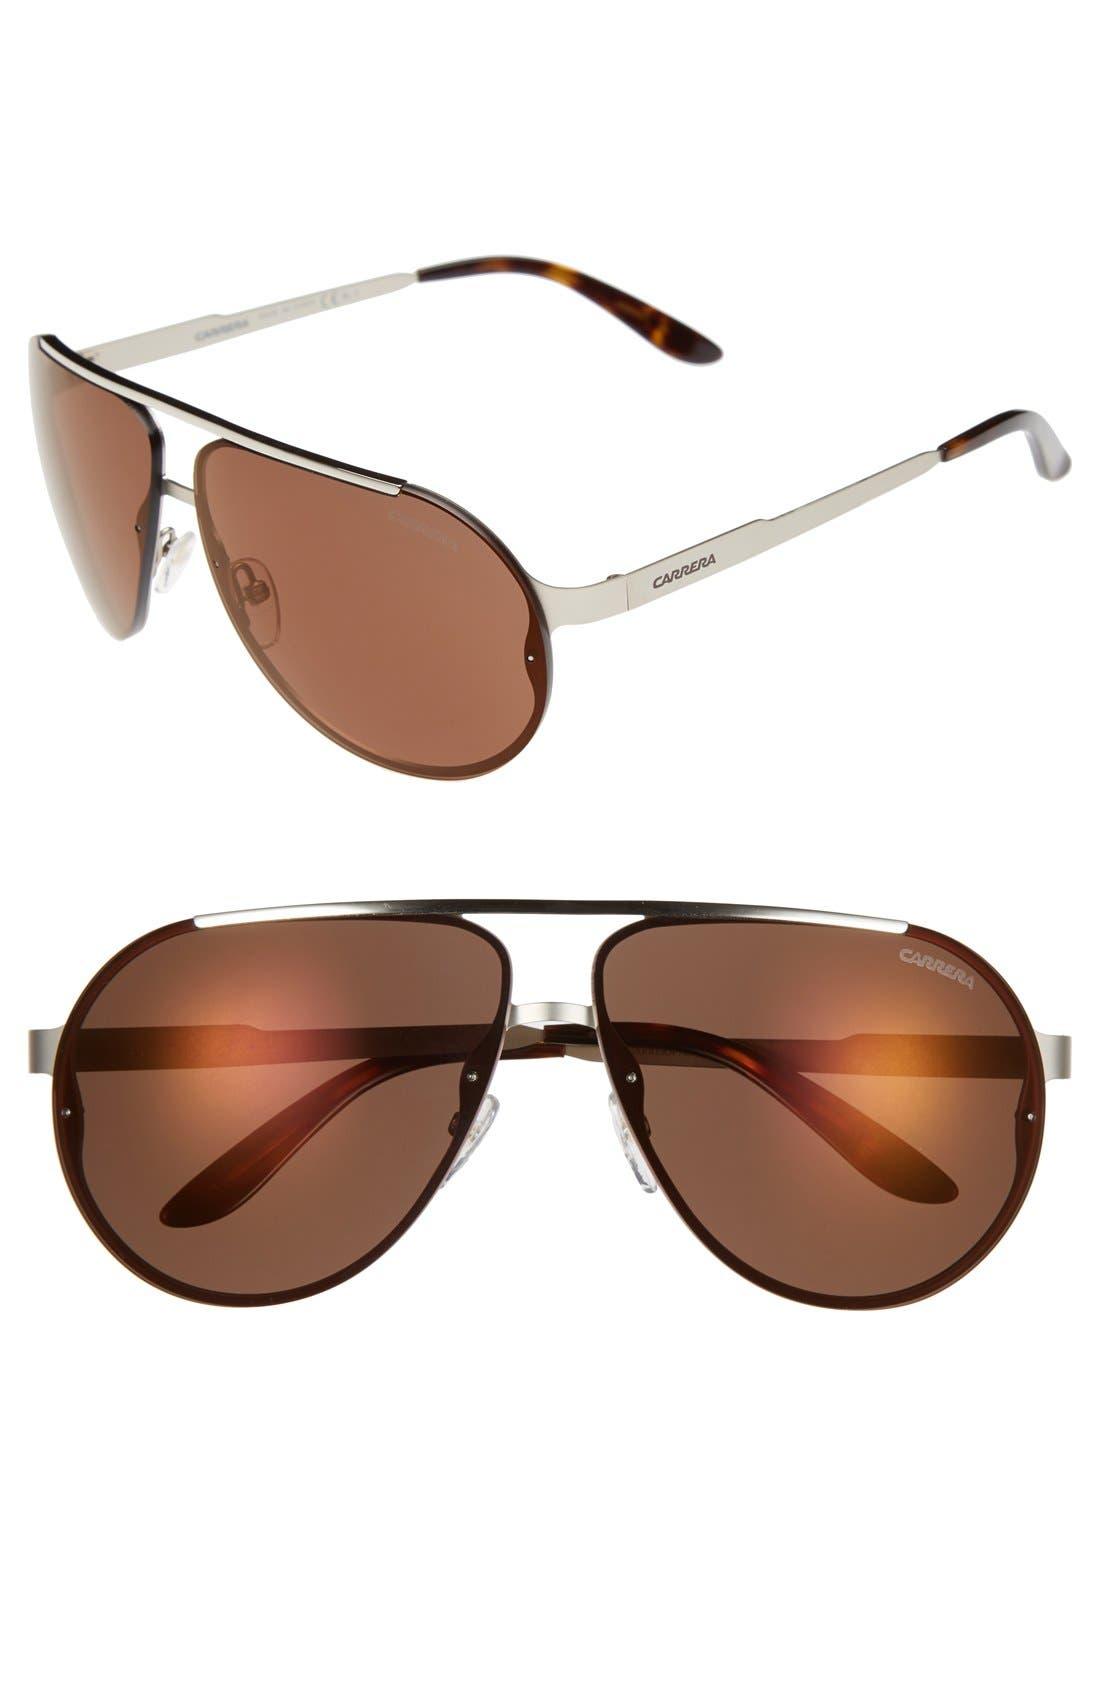 65mm Aviator Sunglasses,                         Main,                         color,